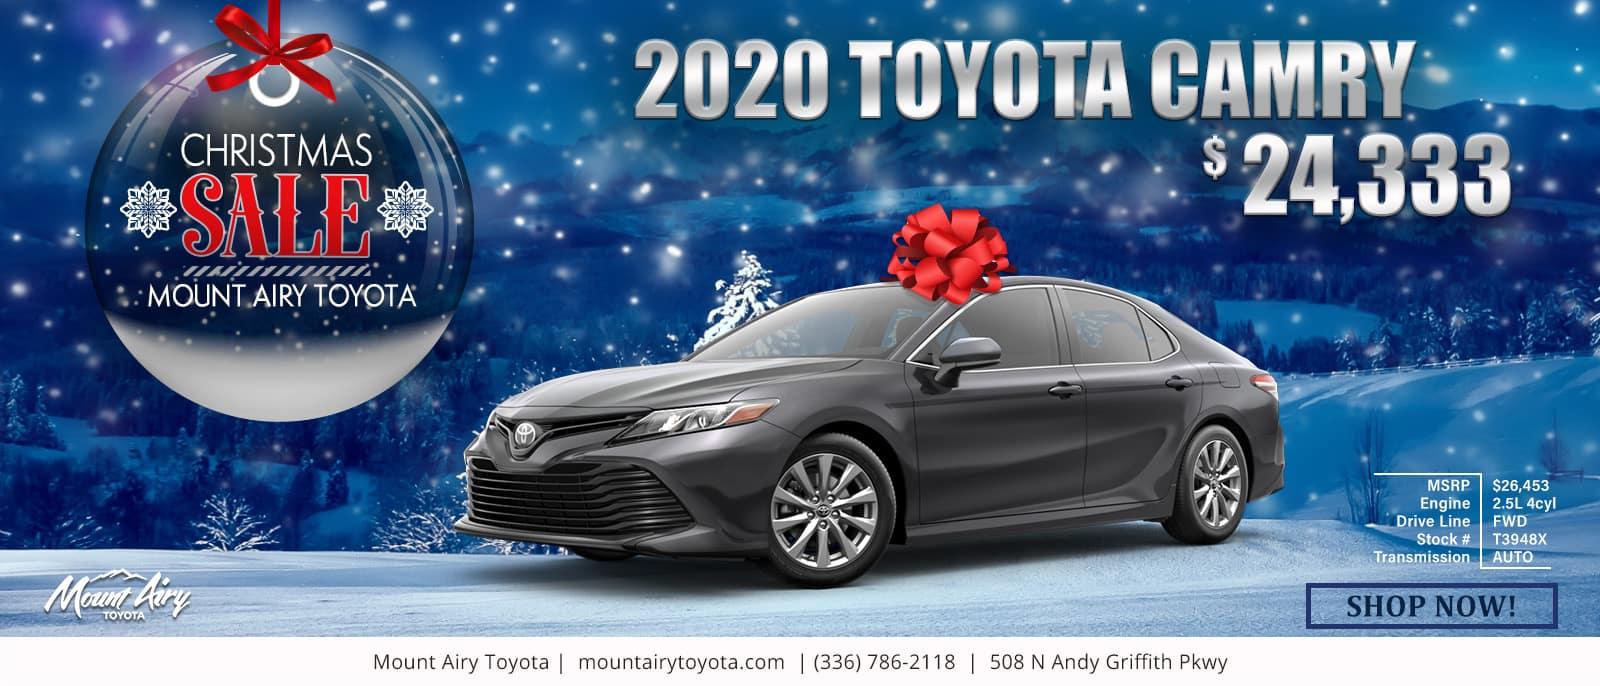 Toyota_November_2020_Slider_Camry